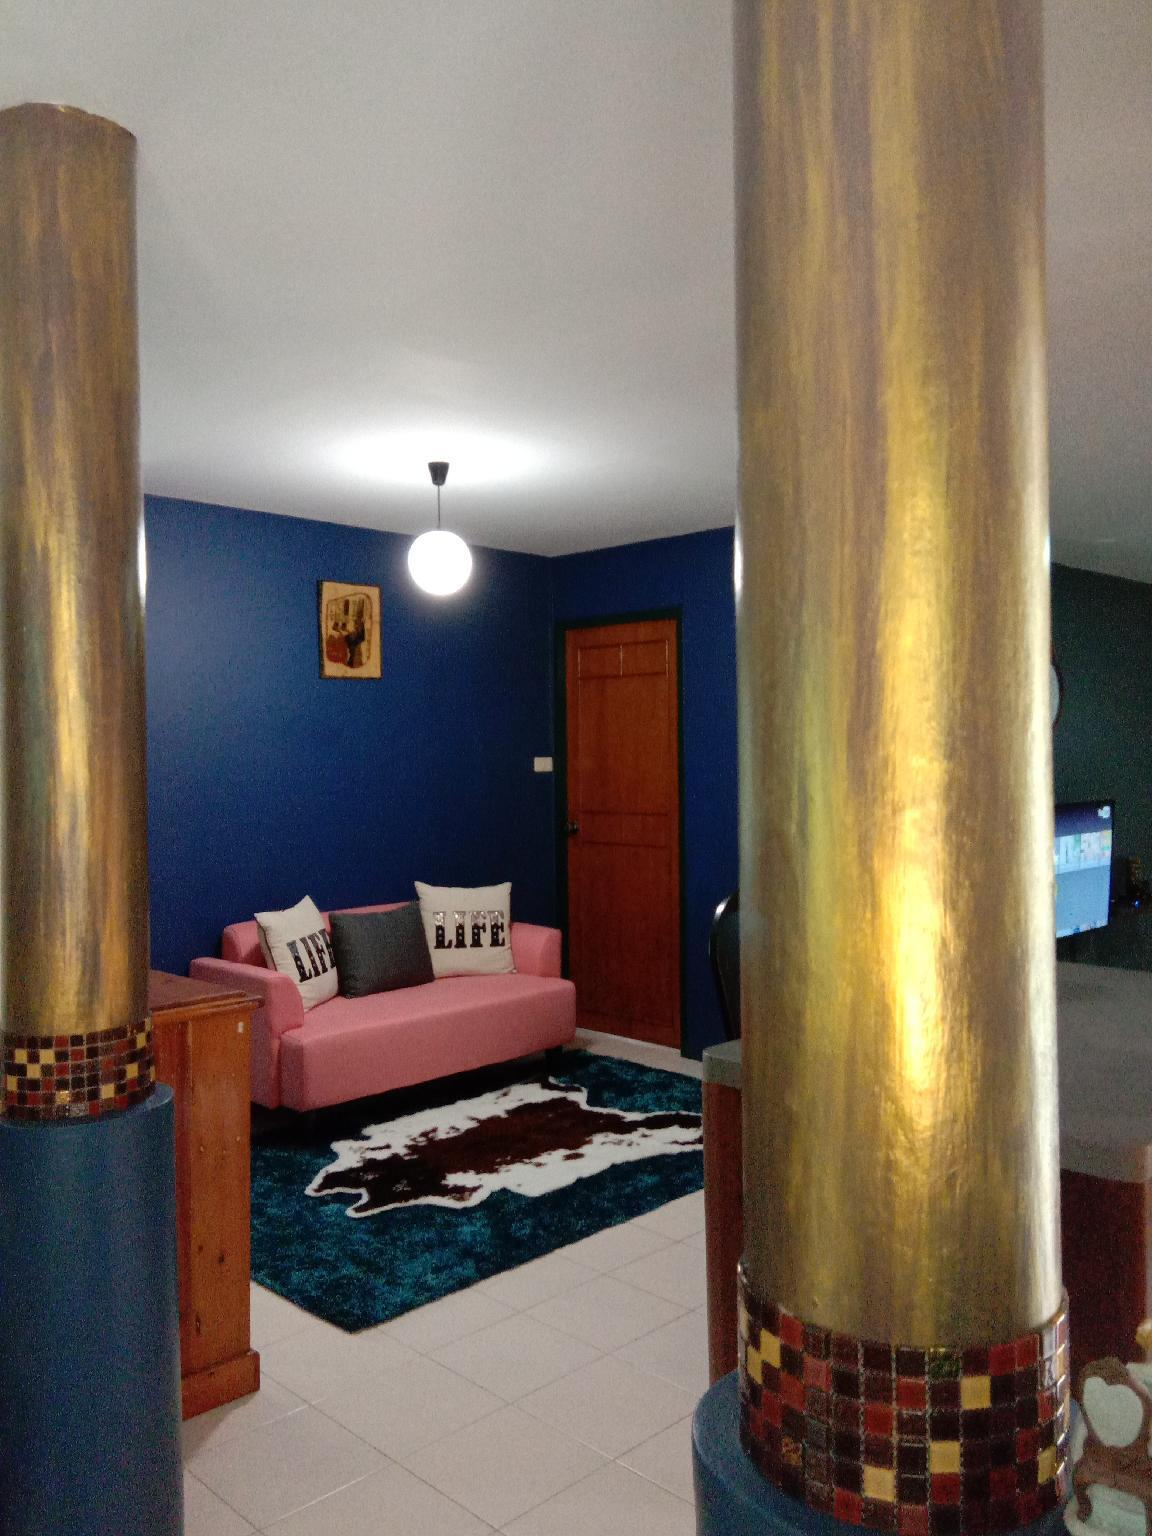 Blue Villa @Pinery Park Beach Rayong 2bdr 2bath วิลลา 2 ห้องนอน 2 ห้องน้ำส่วนตัว ขนาด 200 ตร.ม. – เพ